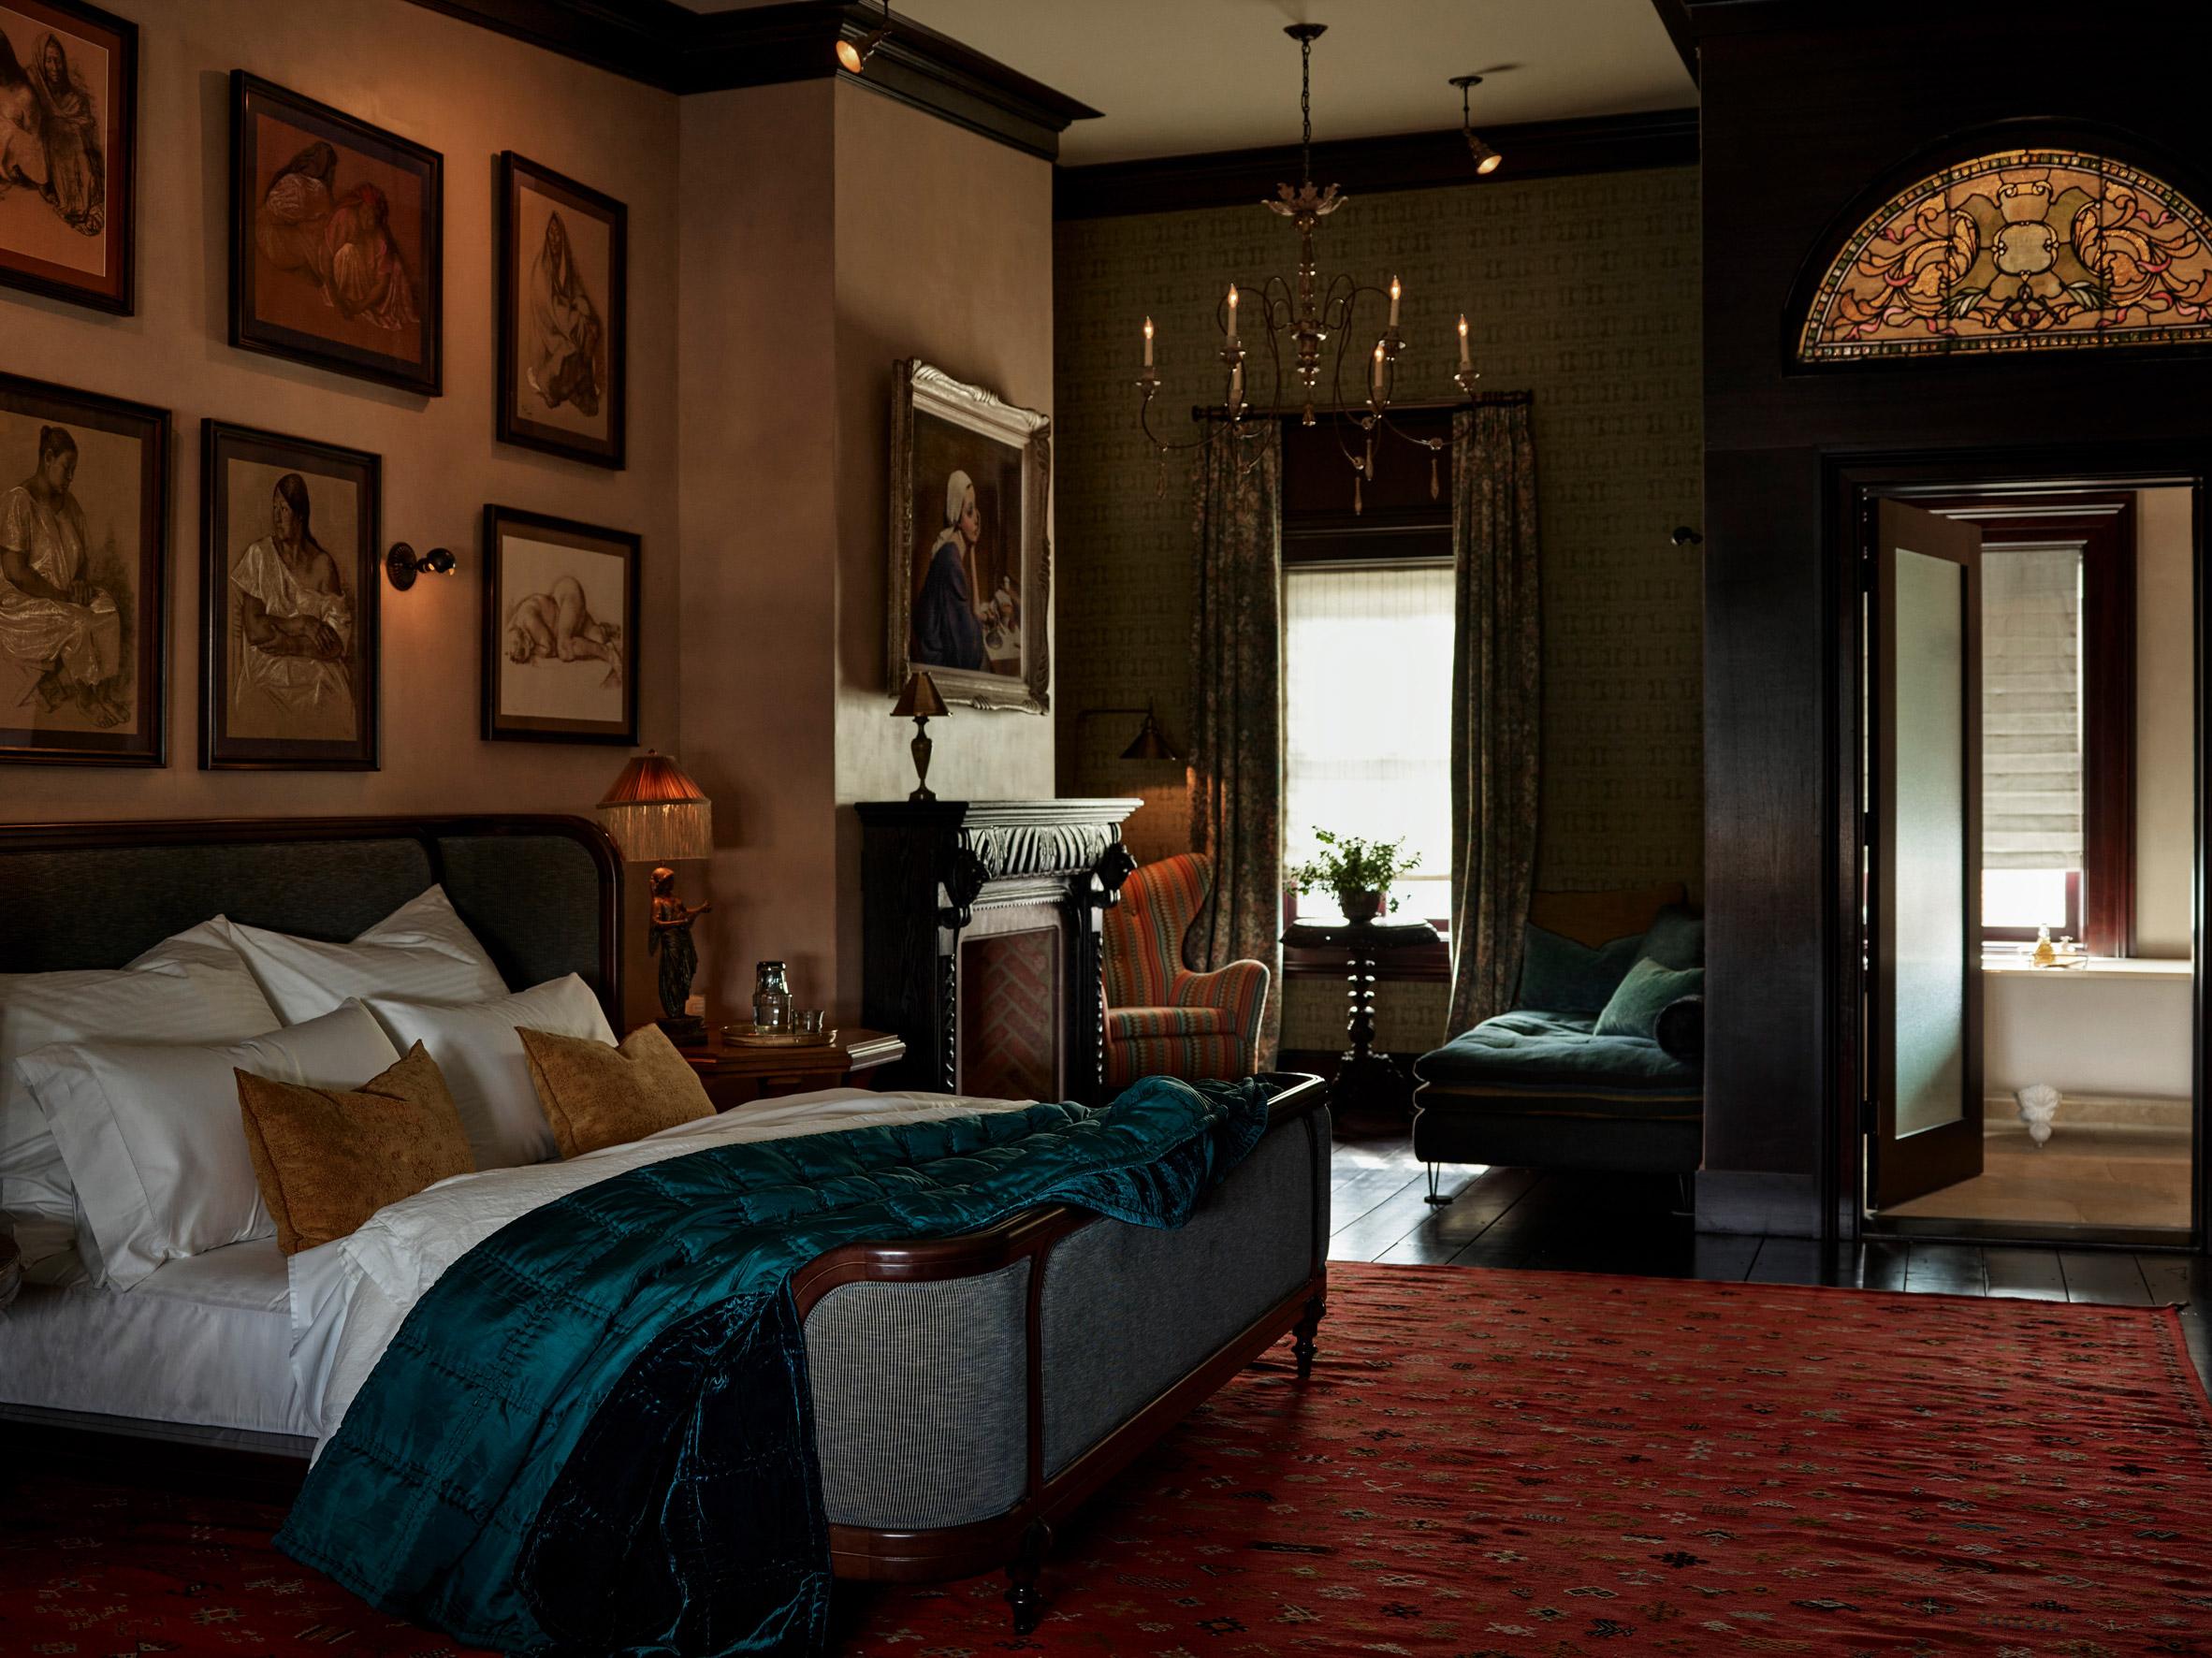 Bedrooms inside The Maker Hotel in Hudson, New York